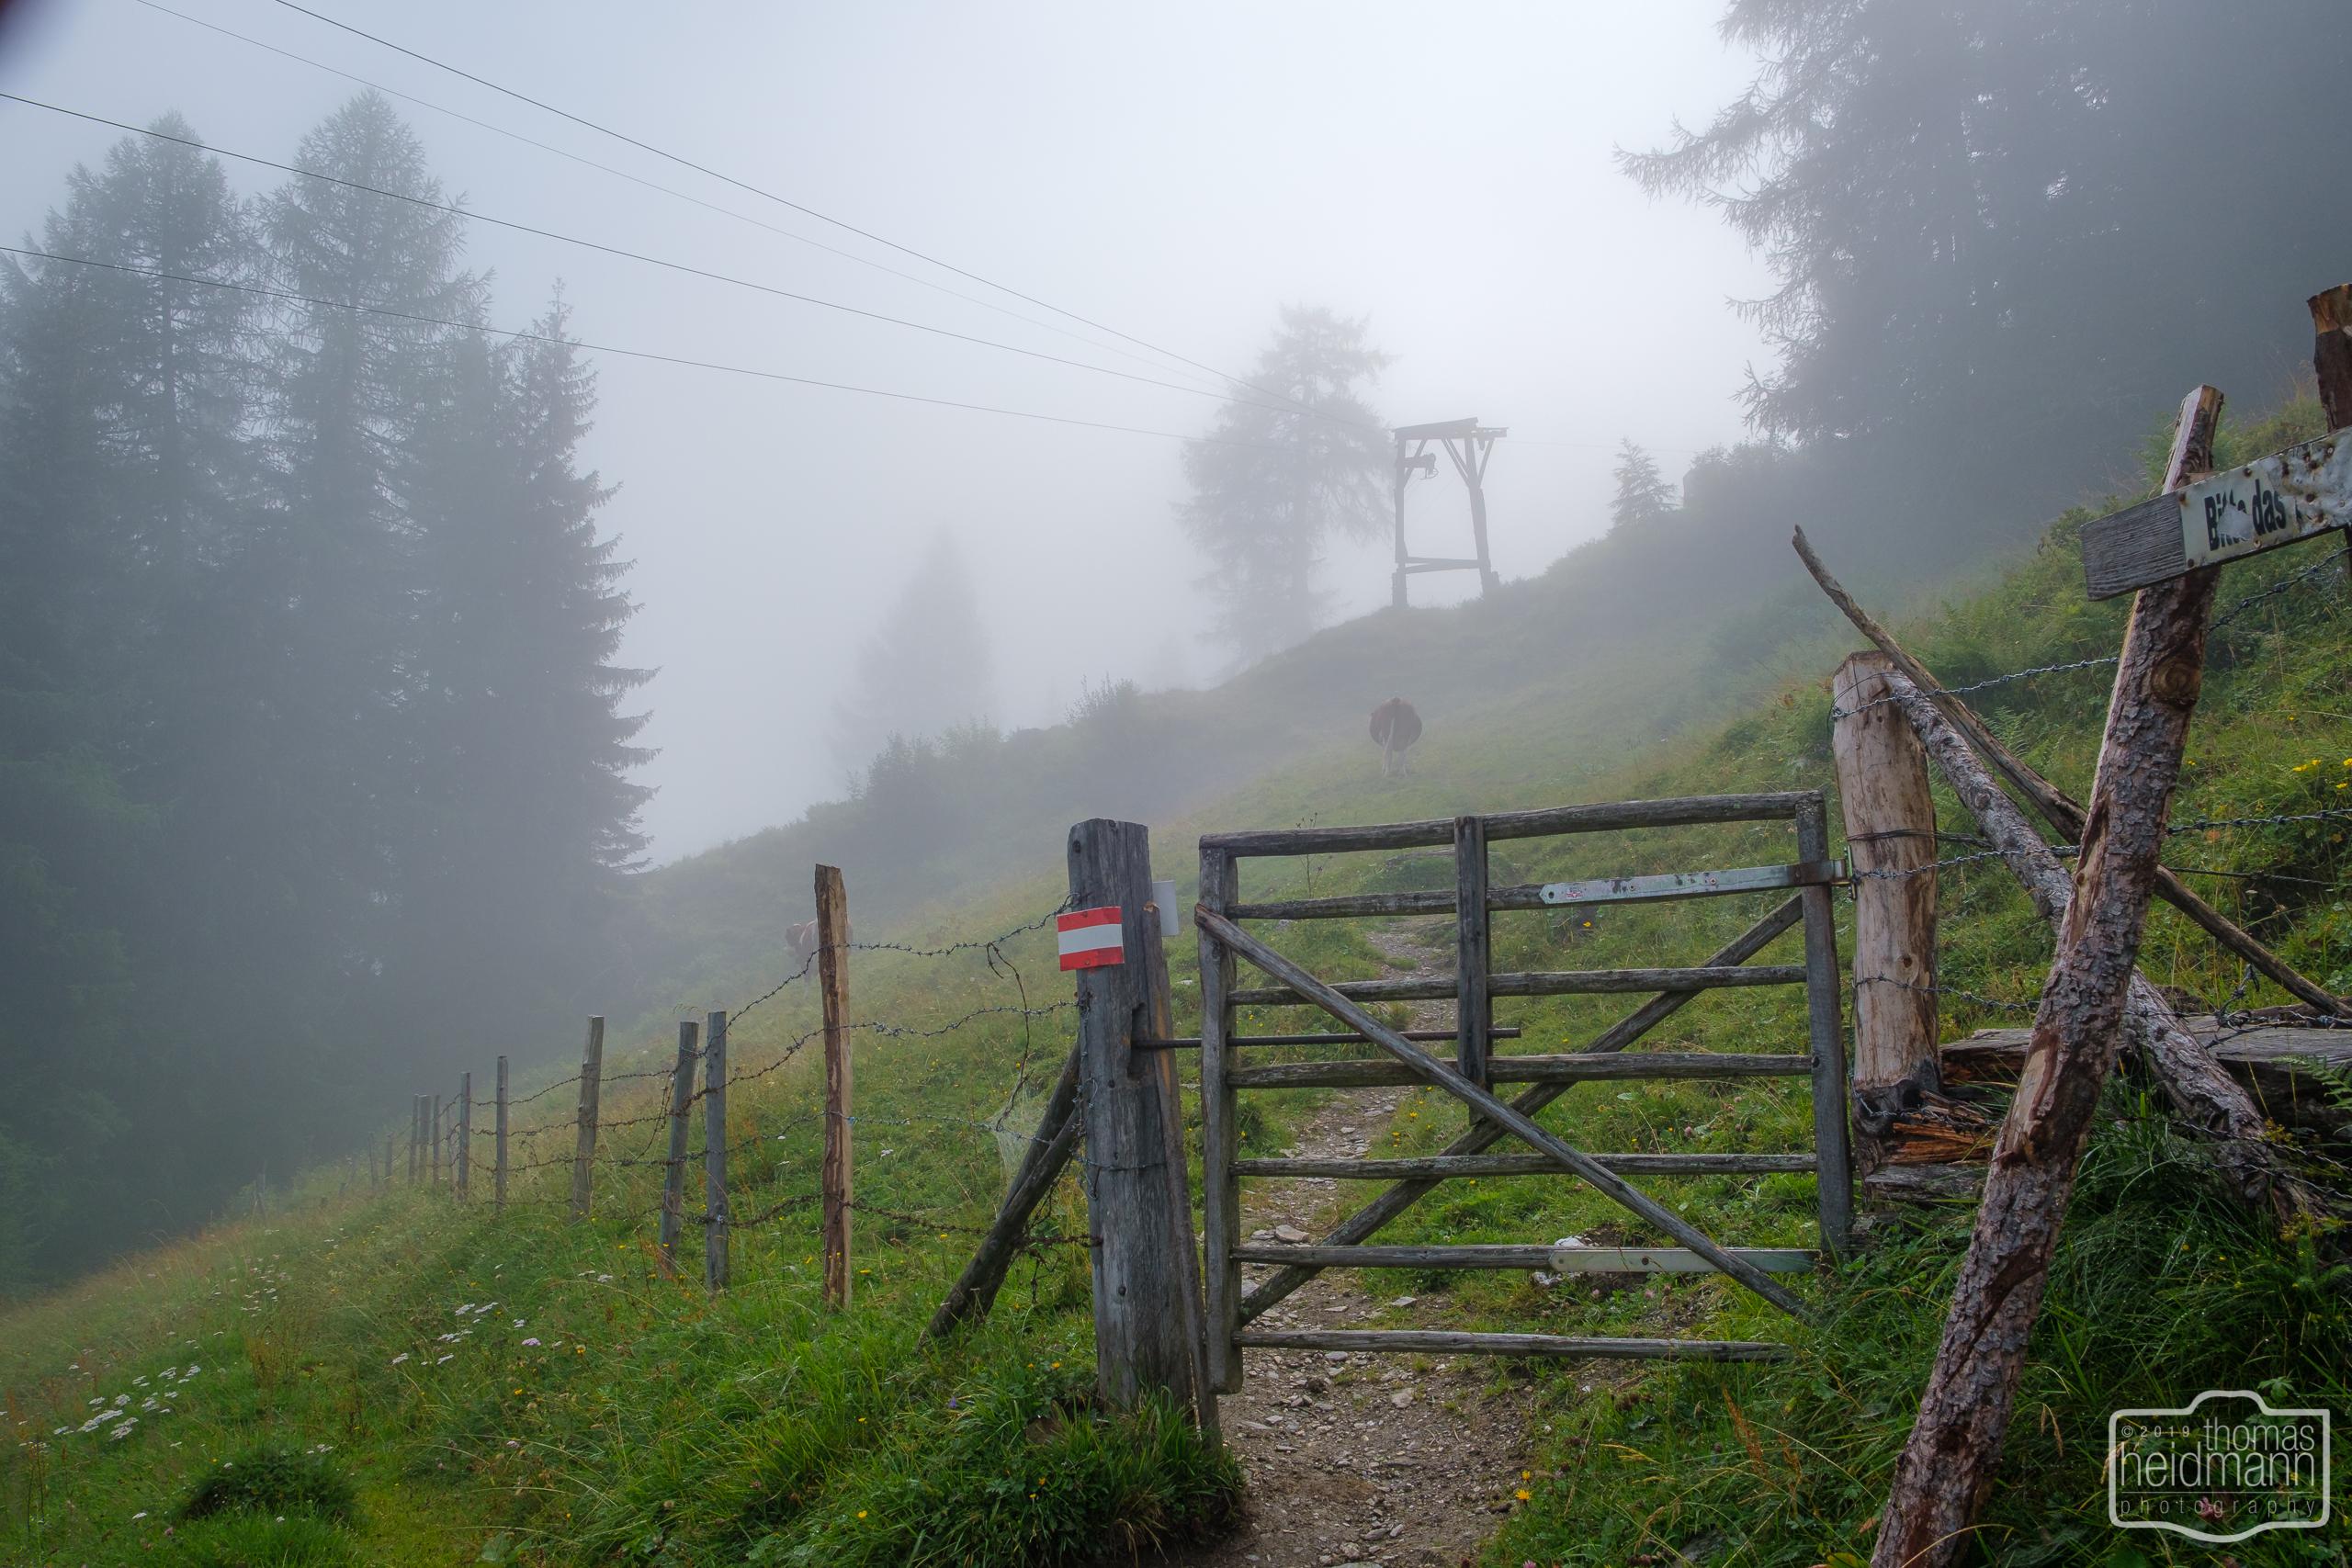 Gratwanderung - Wanderweg im Nebel